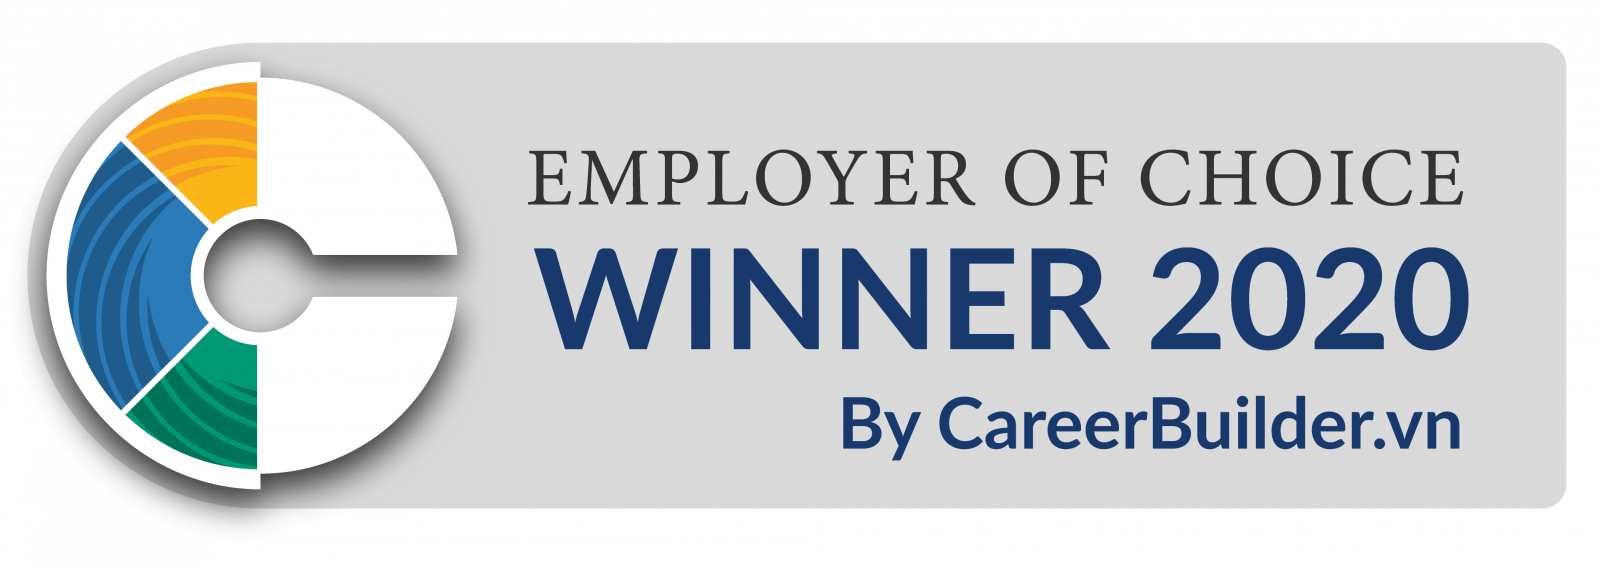 Employer of Choice Winner 2020